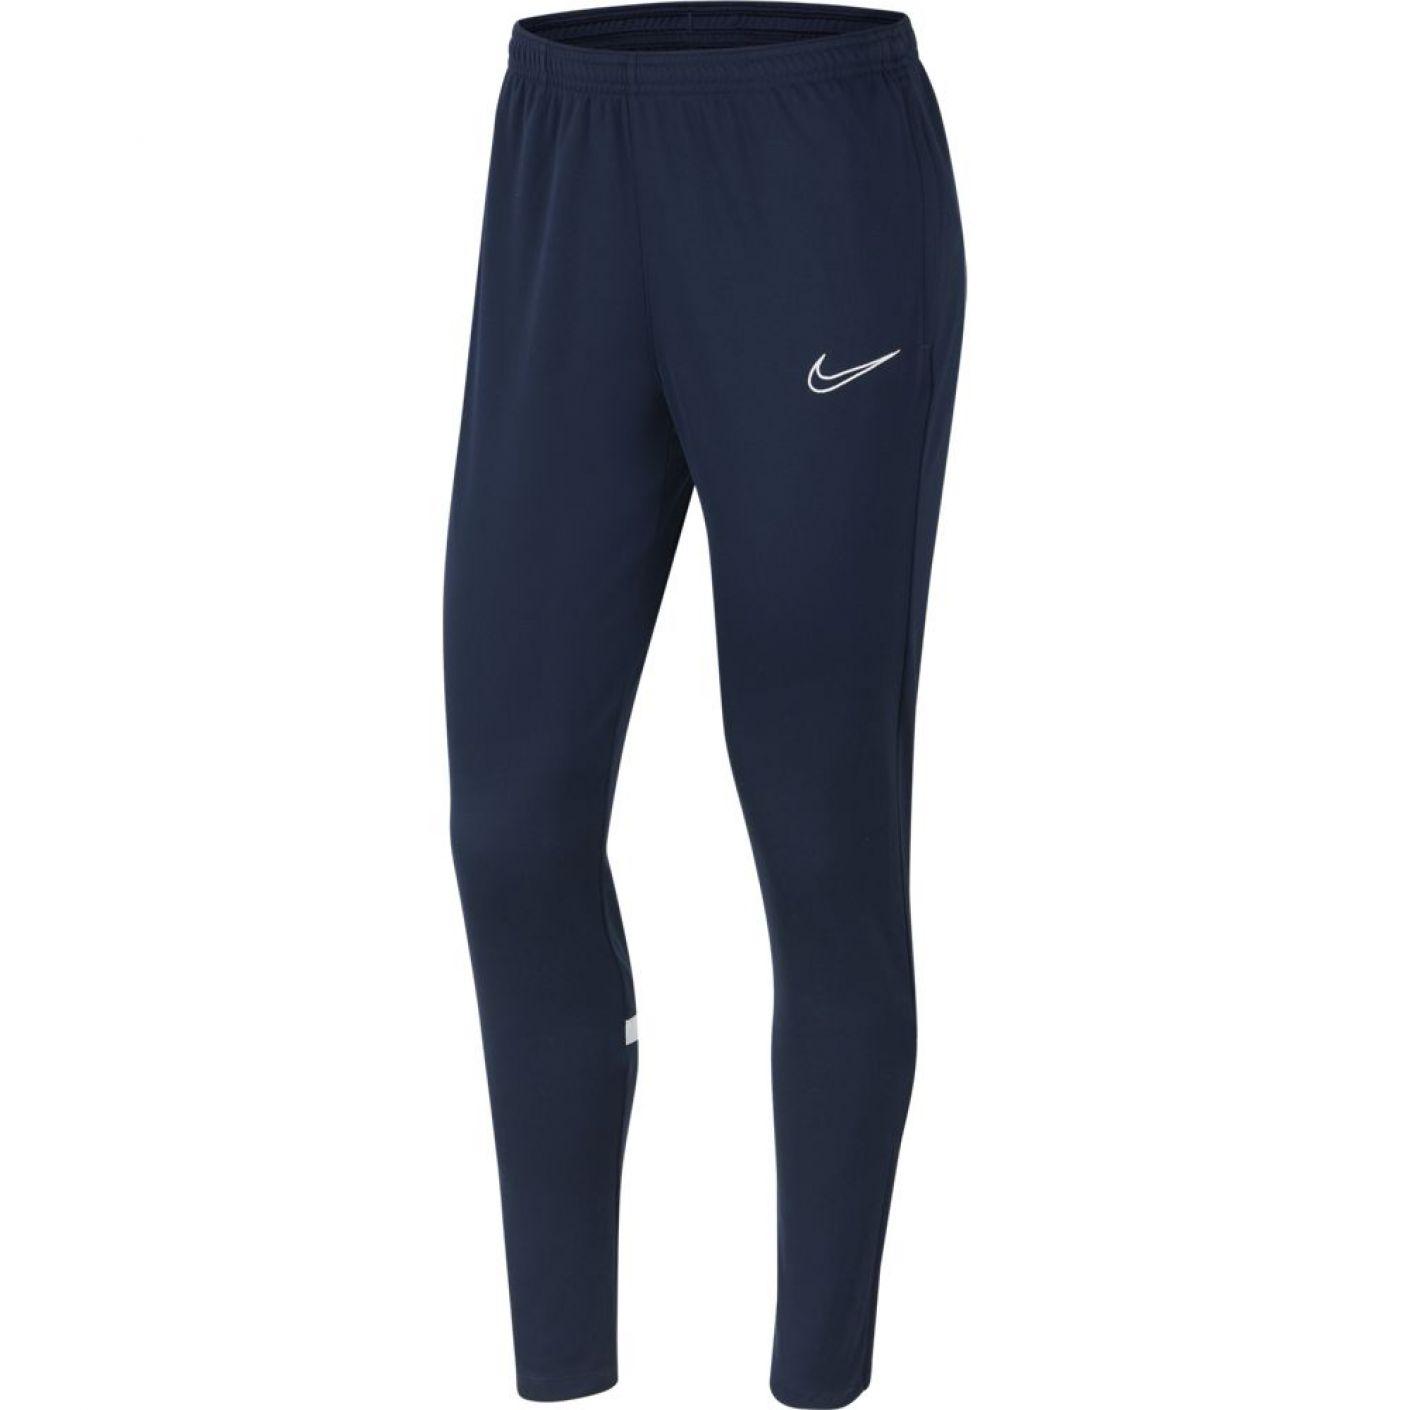 Nike Academy 21 Trainingsbroek KPZ Dri-Fit Vrouwen Donkerblauw